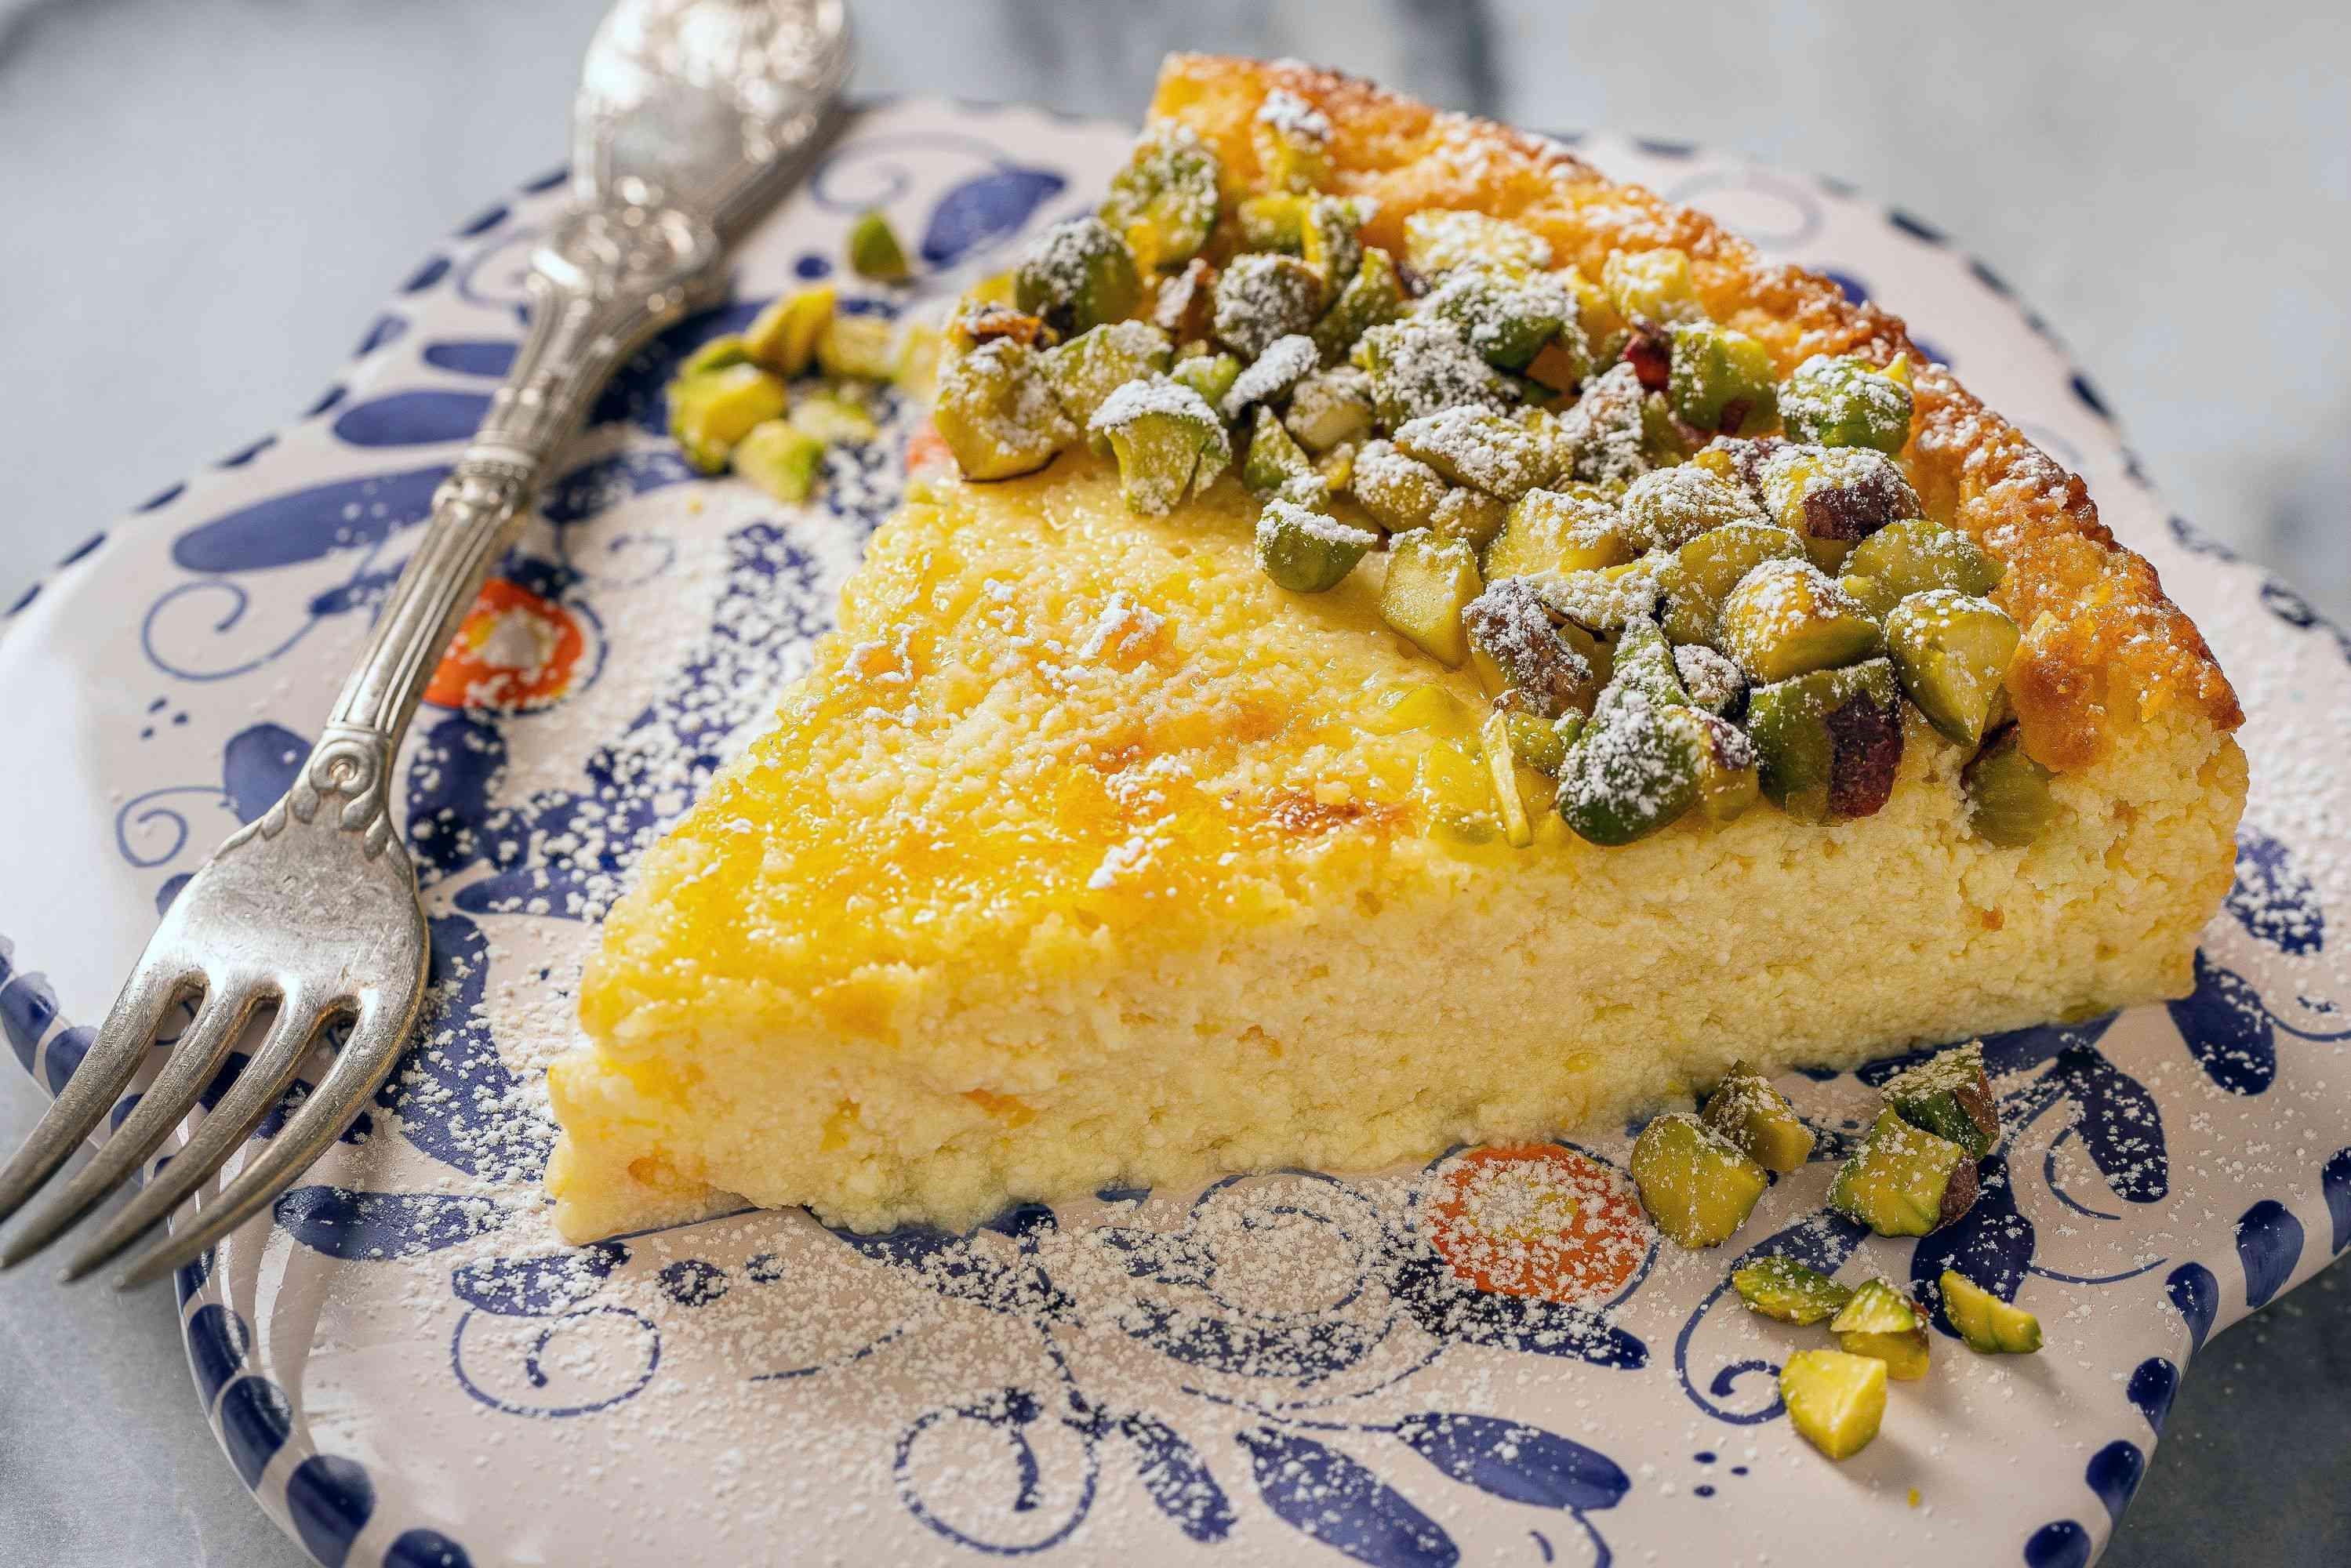 slice of italian cheesecake